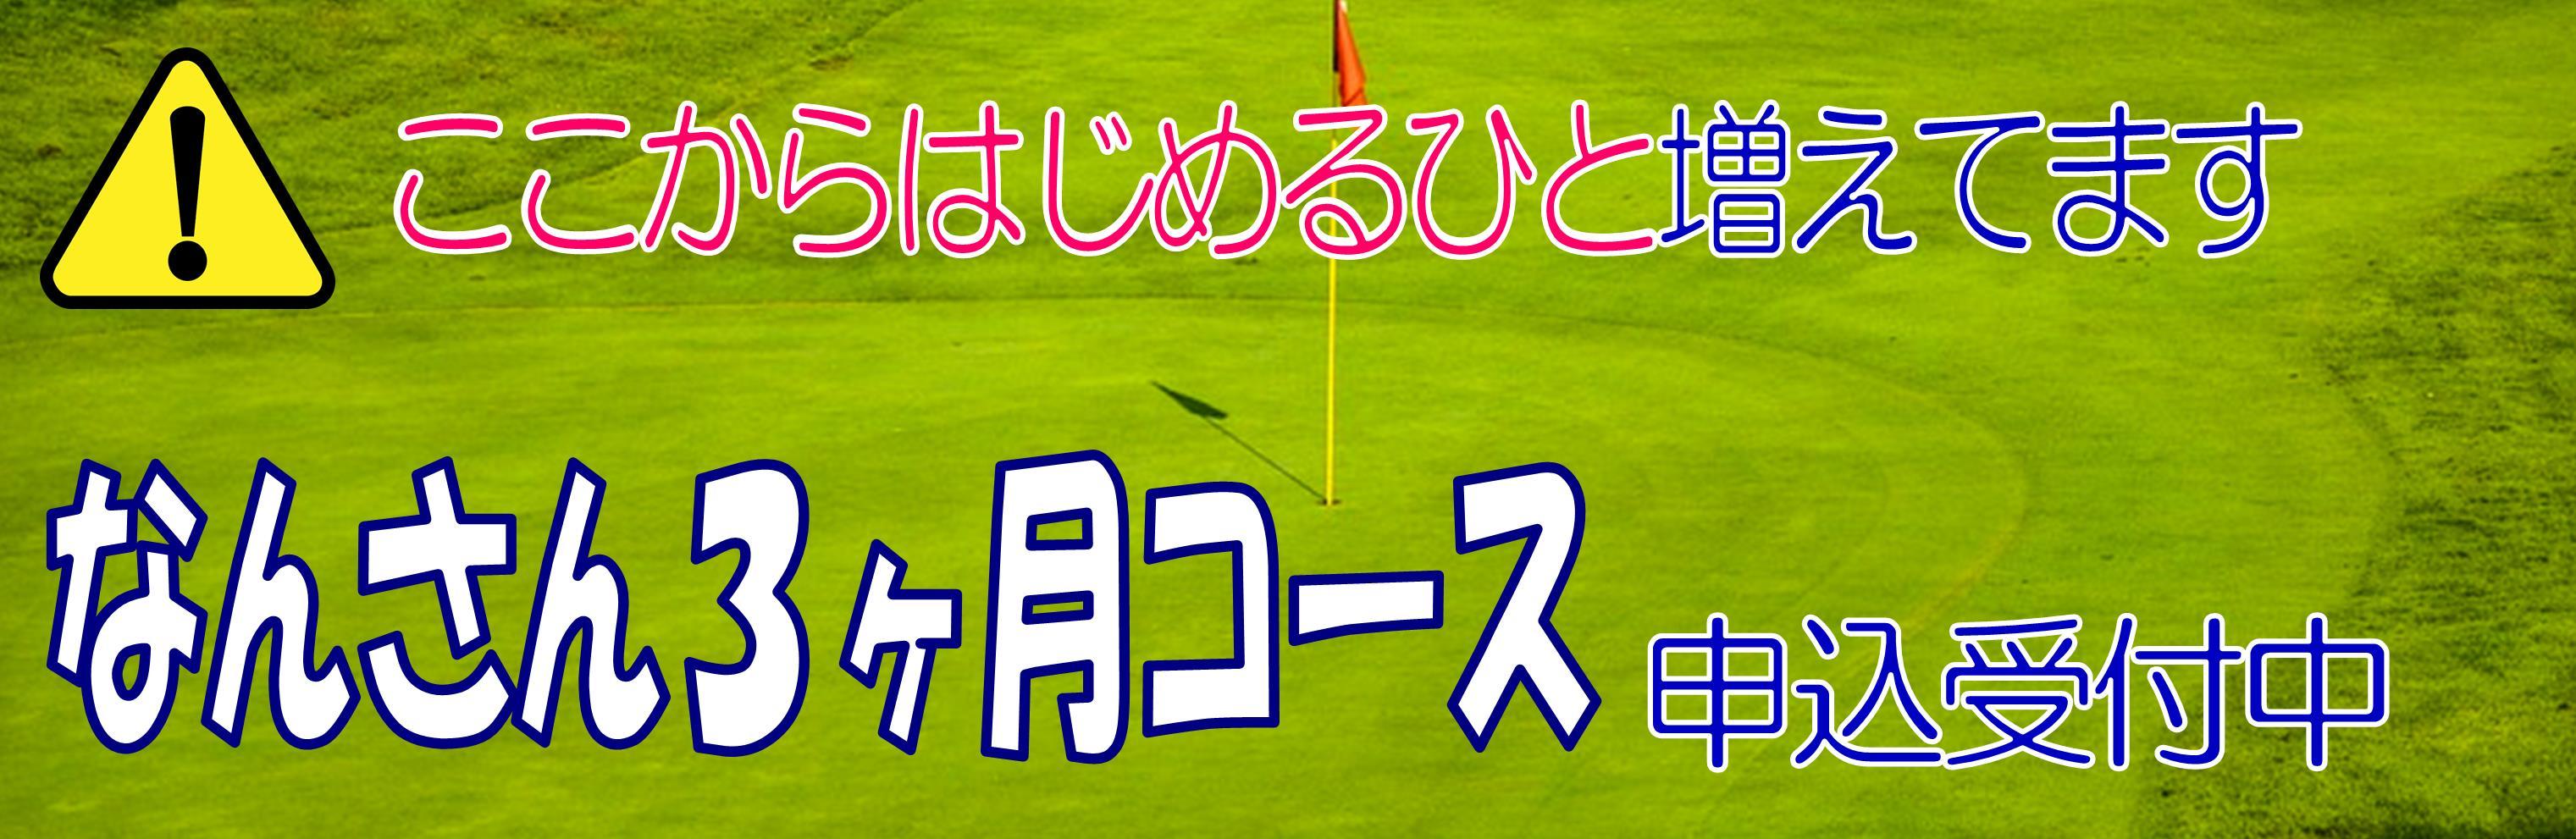 https://www.bsga.jp/kumamoto/golf-news/2018/04/2081/